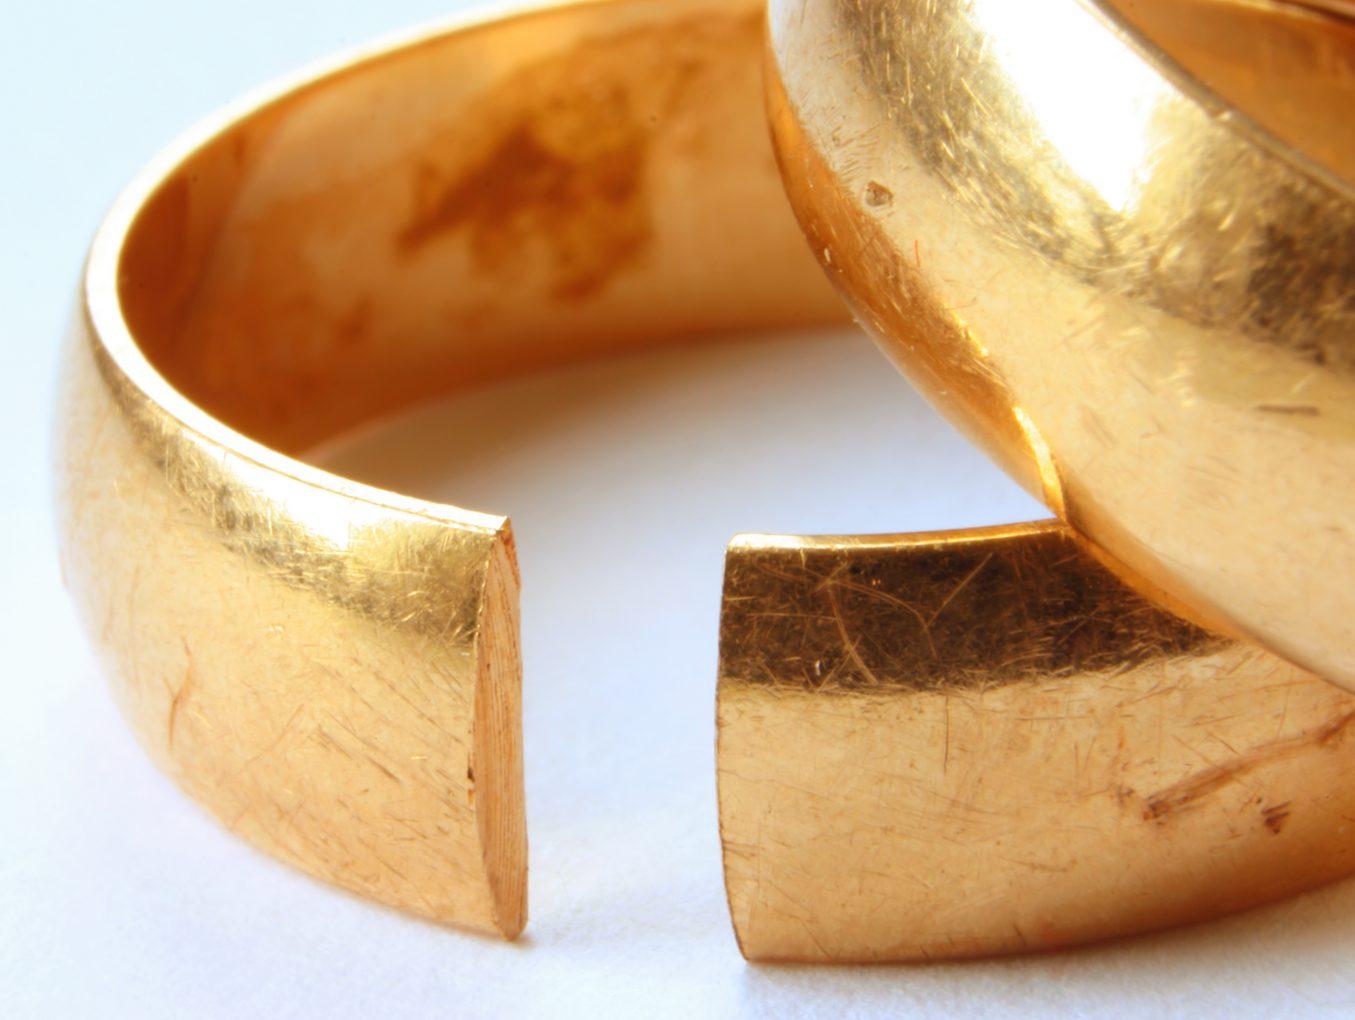 Spinnaker Investment Ceo Morgan Christen Has New Divorce Financial